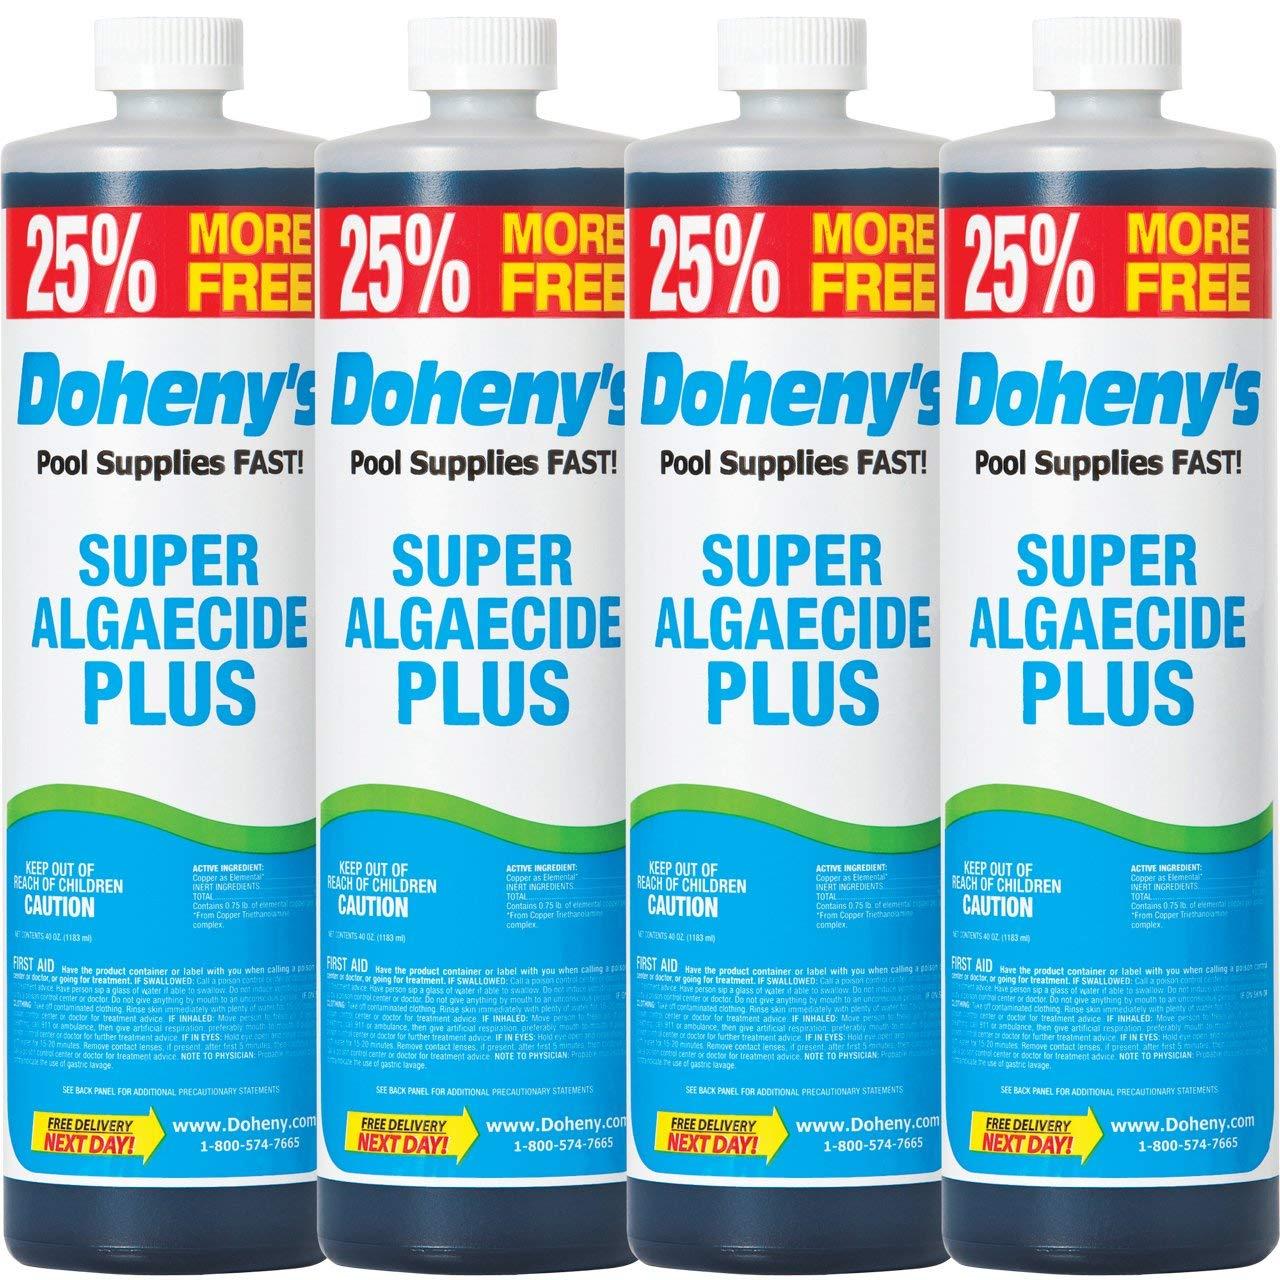 Doheny's Super Algaecide Plus (4) 1 Qt. + 32 oz. Free! by Doheny's